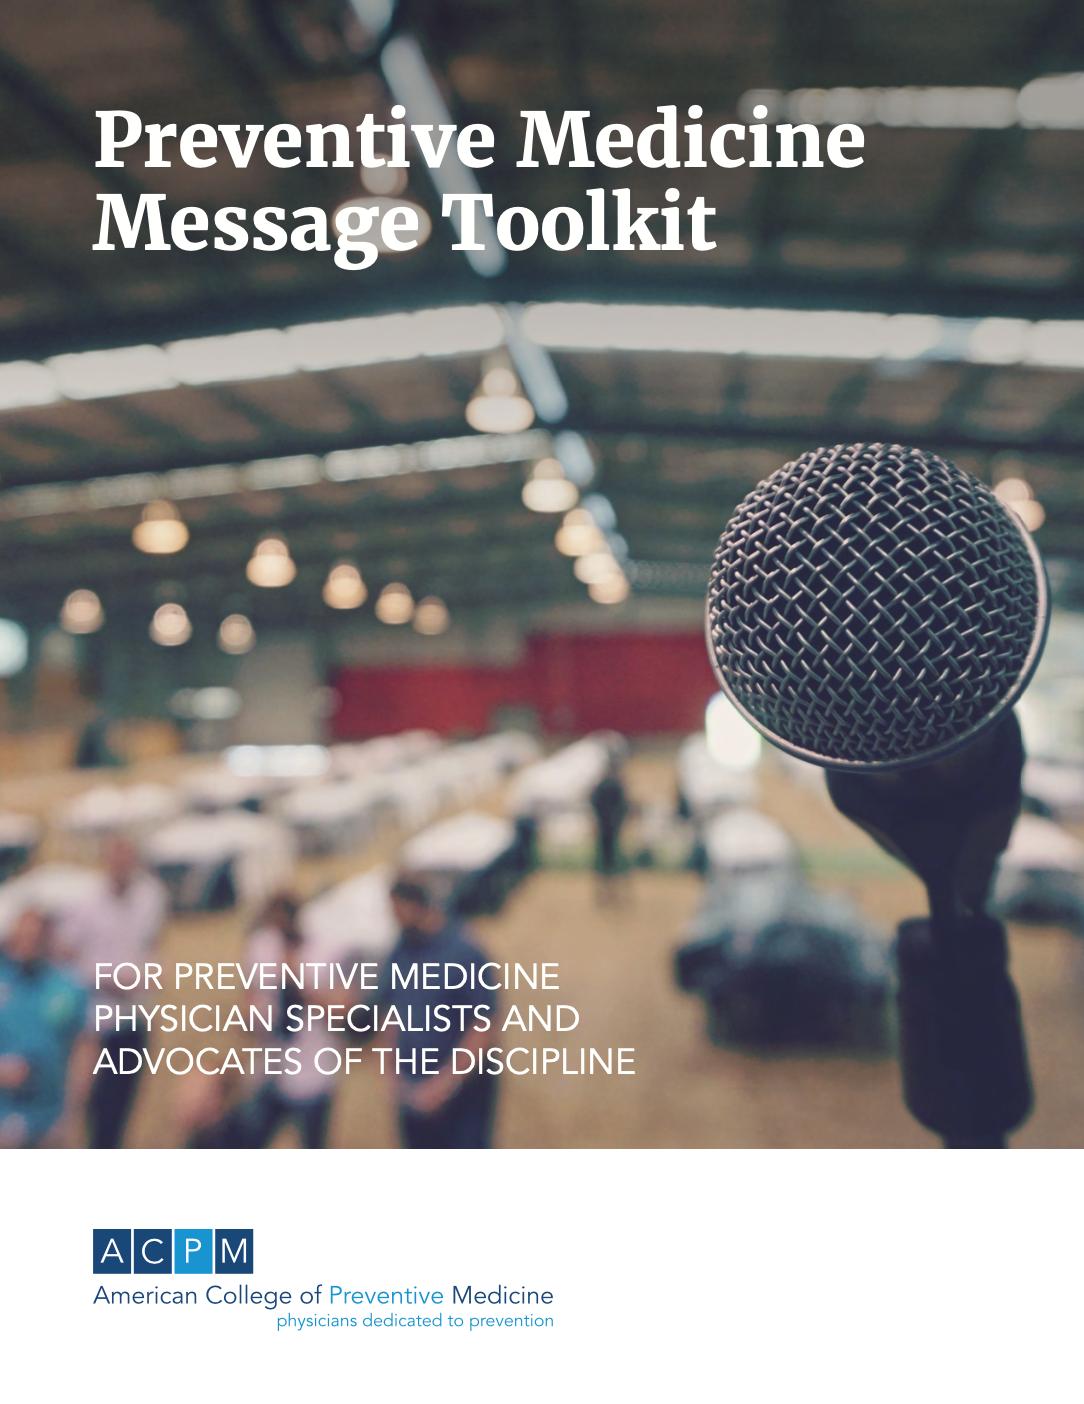 Preventive Medicine Message Toolkit microphone picture